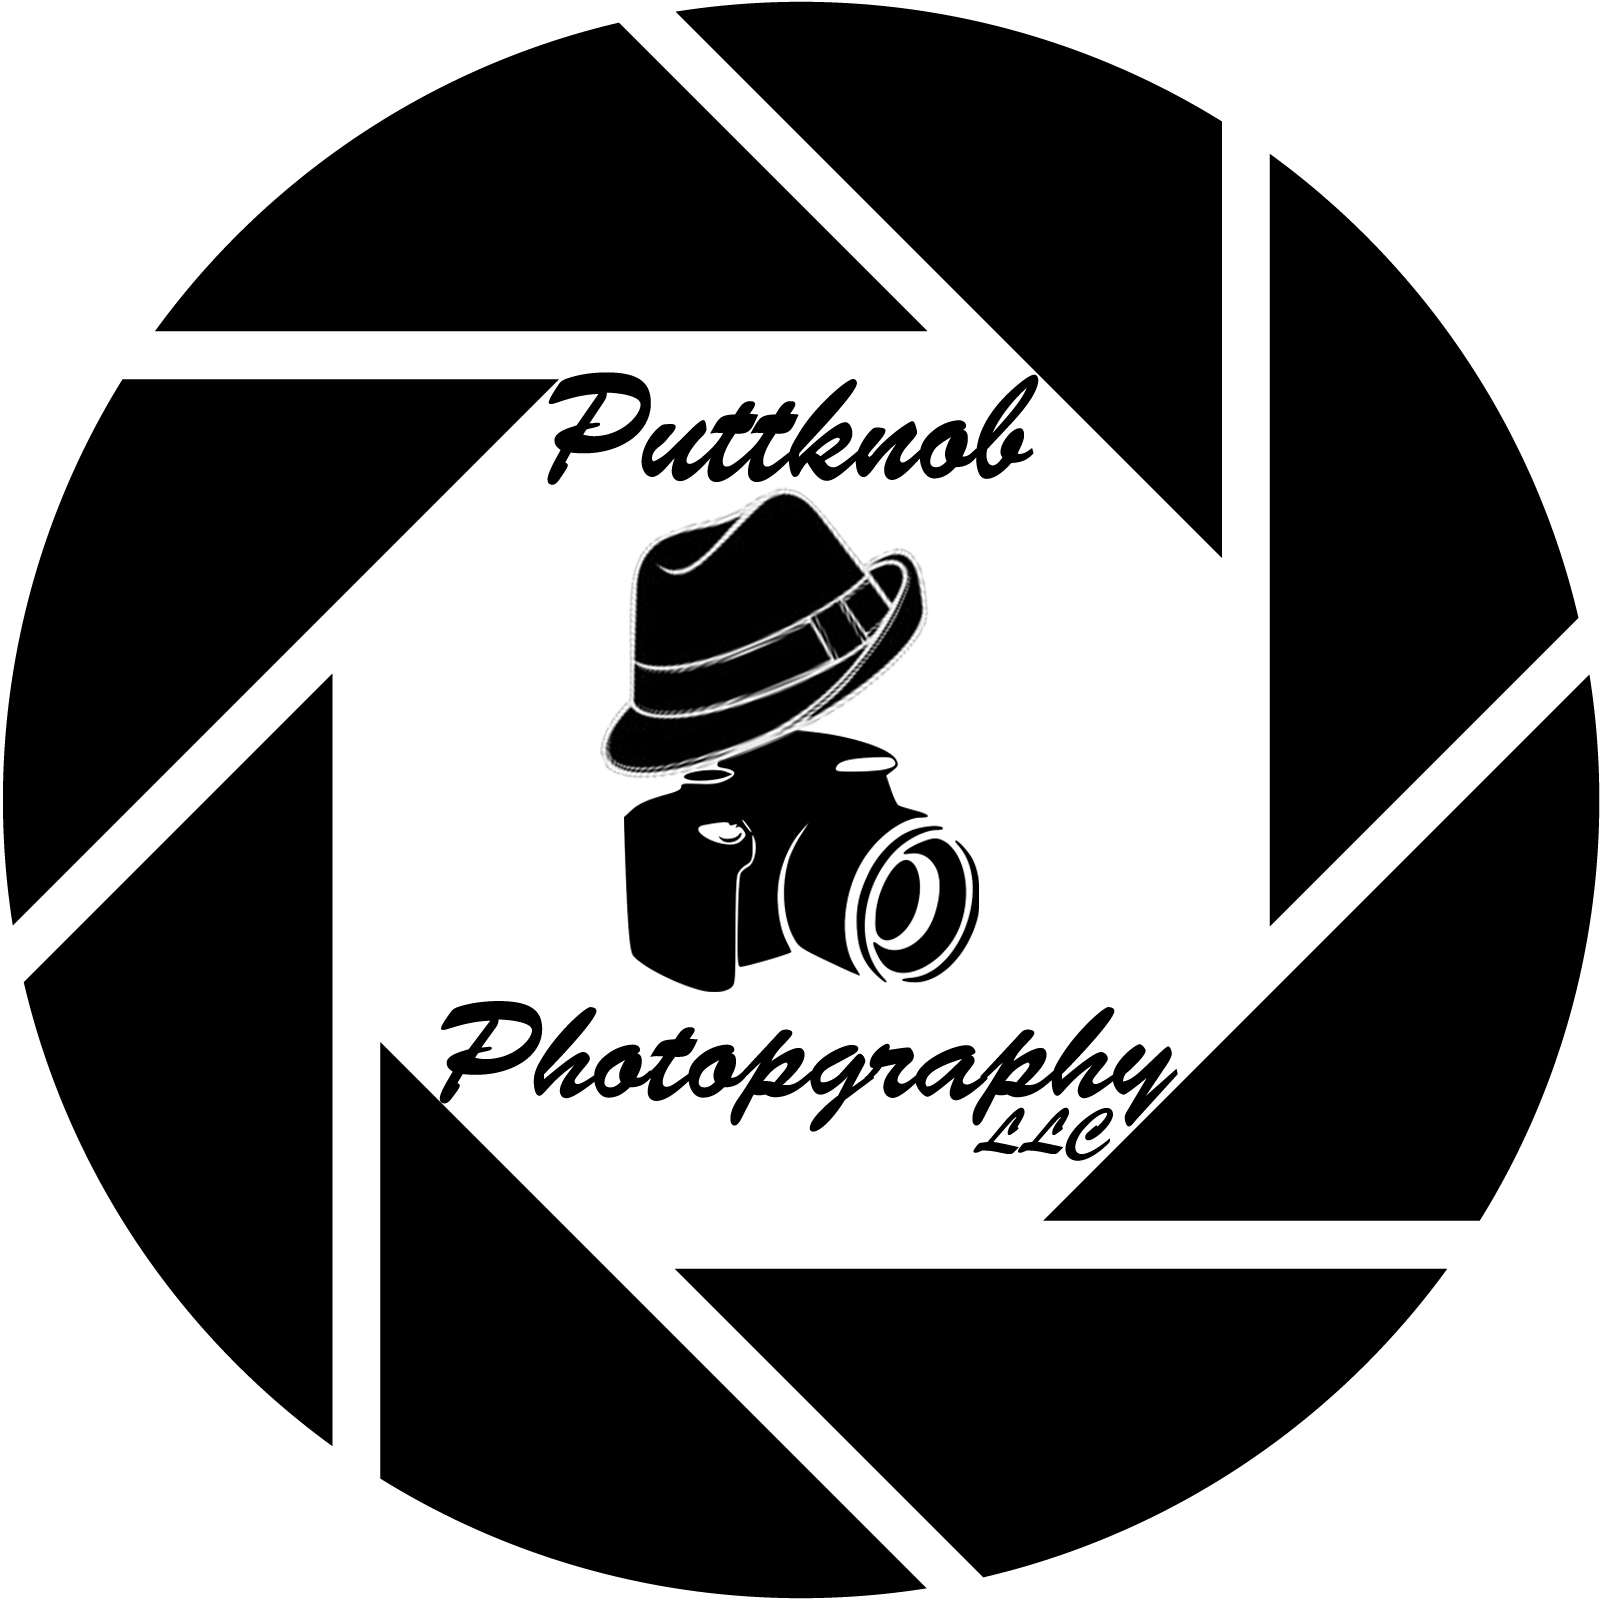 Puttknob Photography, LLC